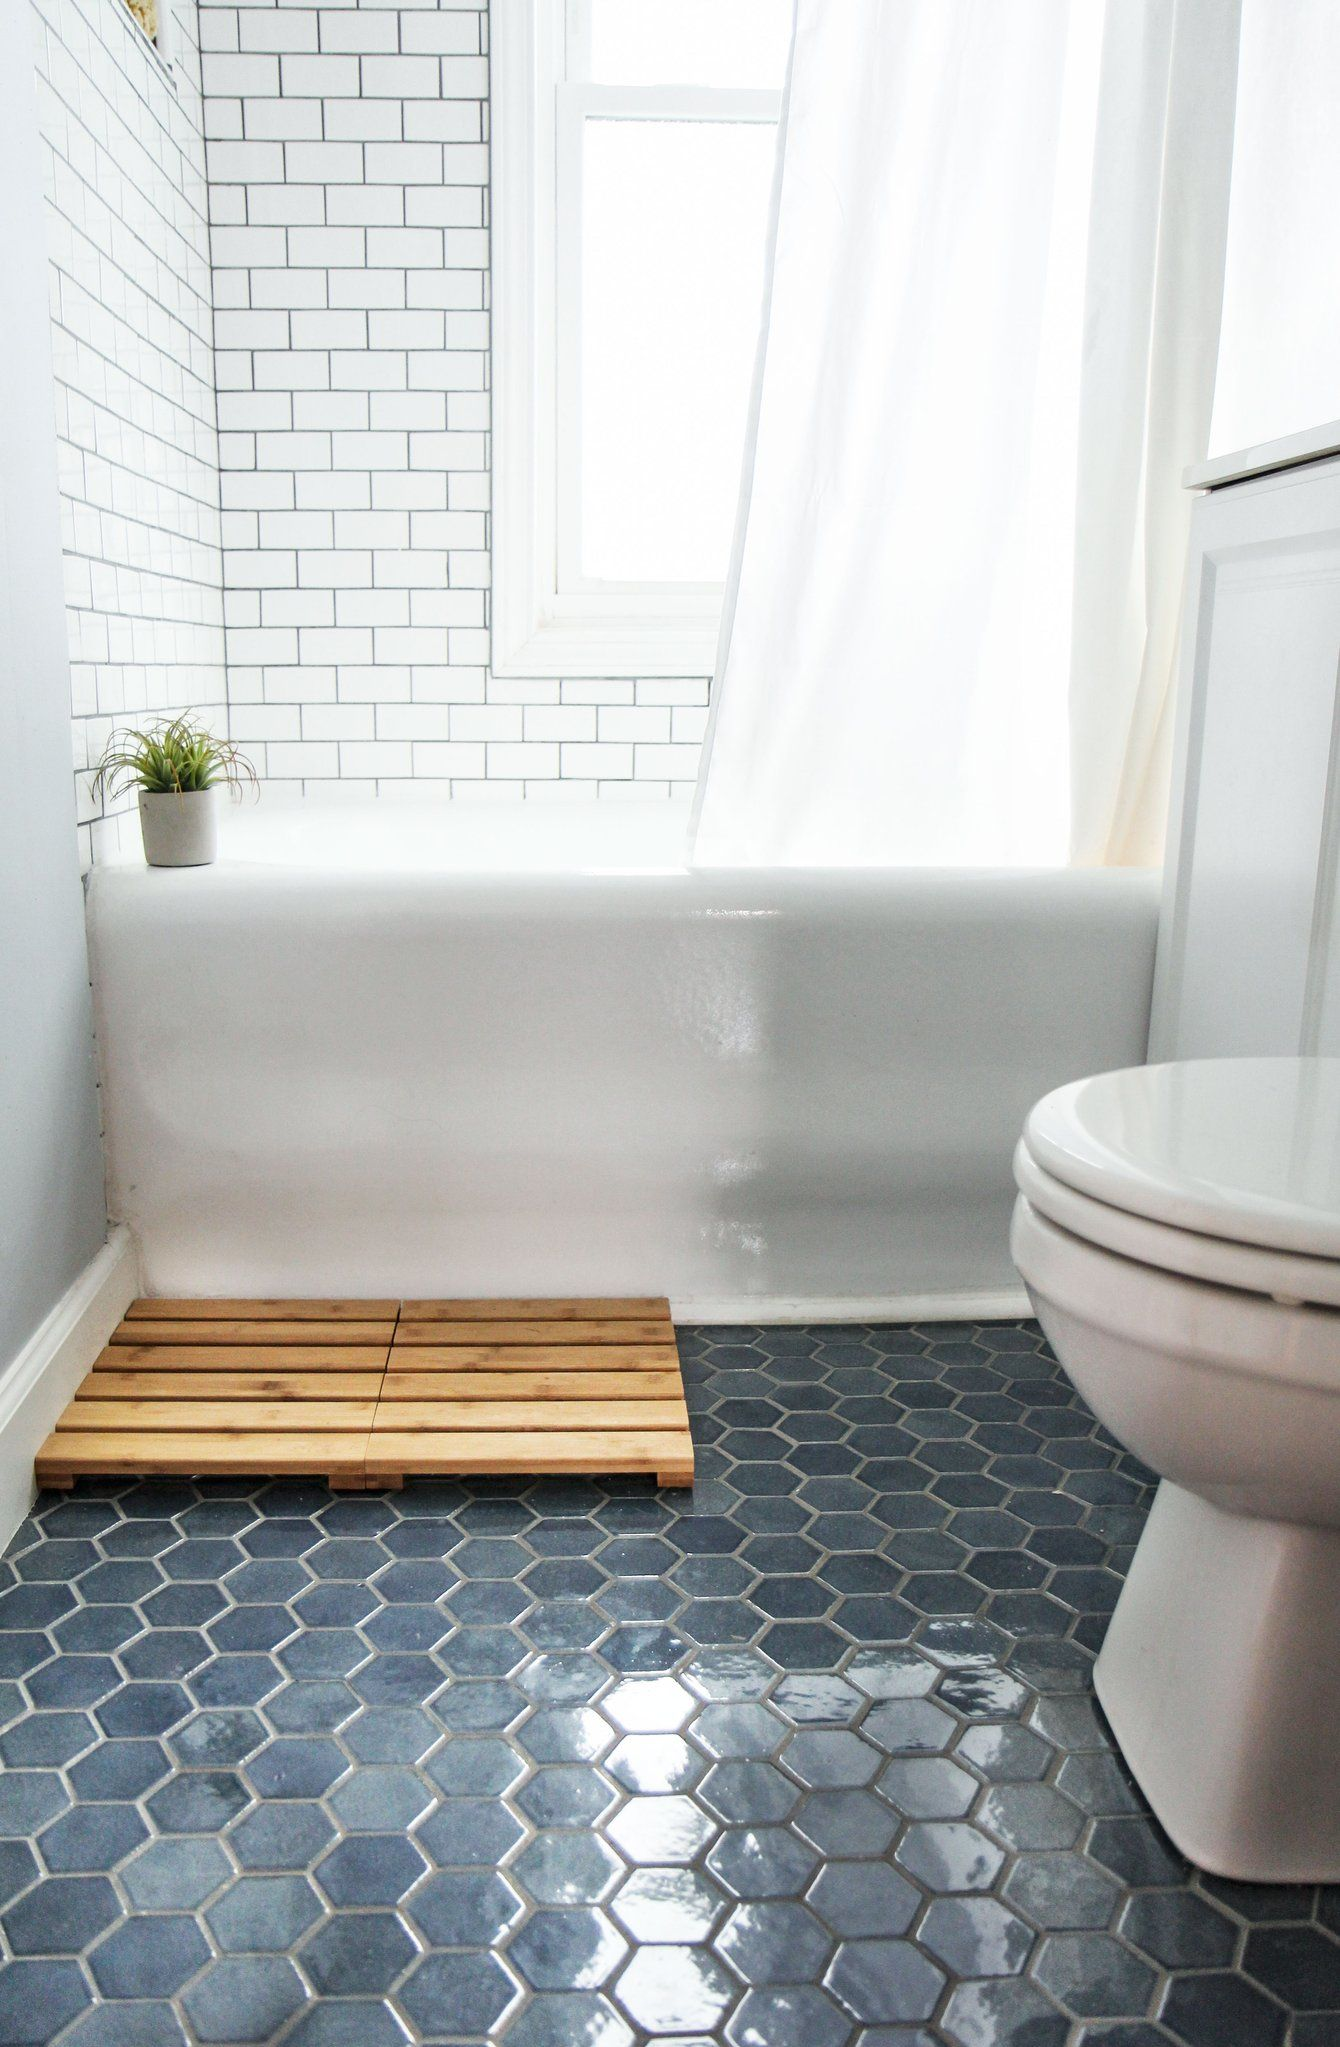 8 Things I Learned During My Bathroom Tile Renovation Bathroom Tile Renovation Tile Renovation Tile Bathroom